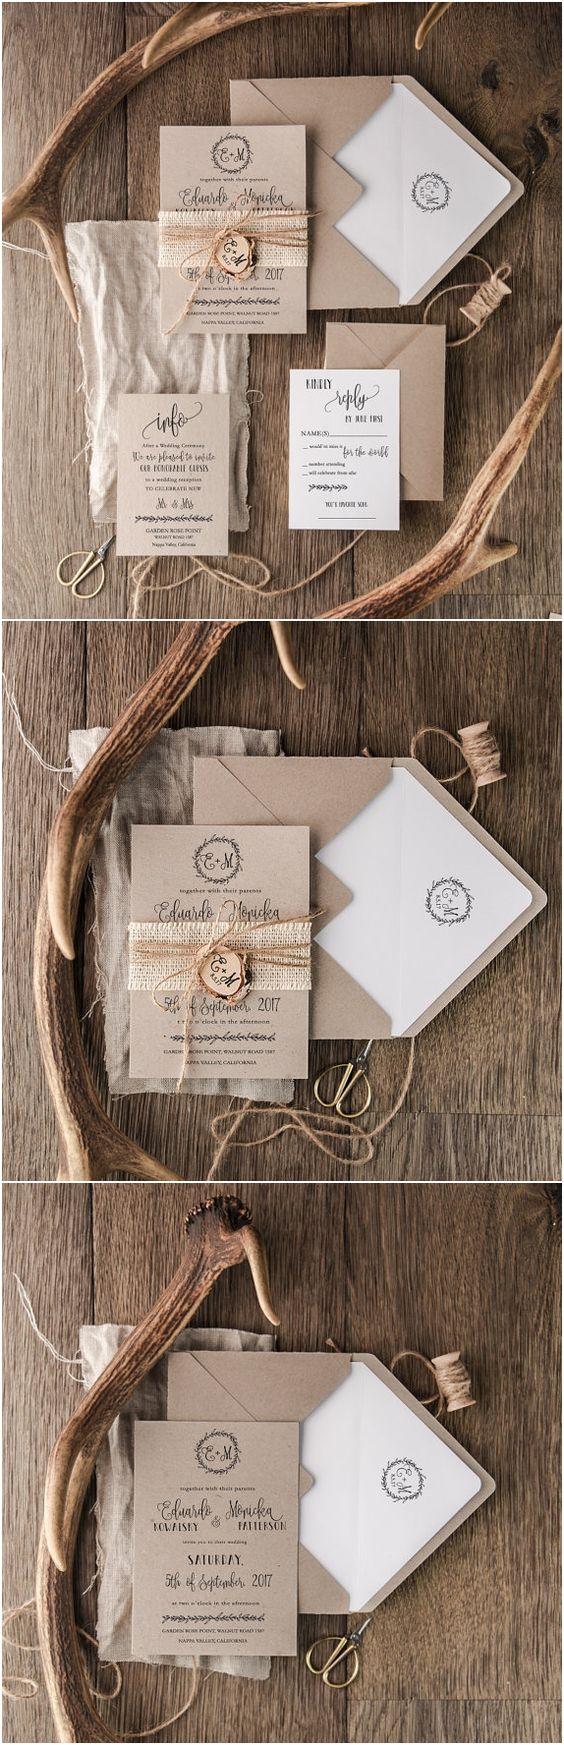 rustic wedding invitations rustic wedding invitation Burlap Wooden Rustic Wedding Invitation